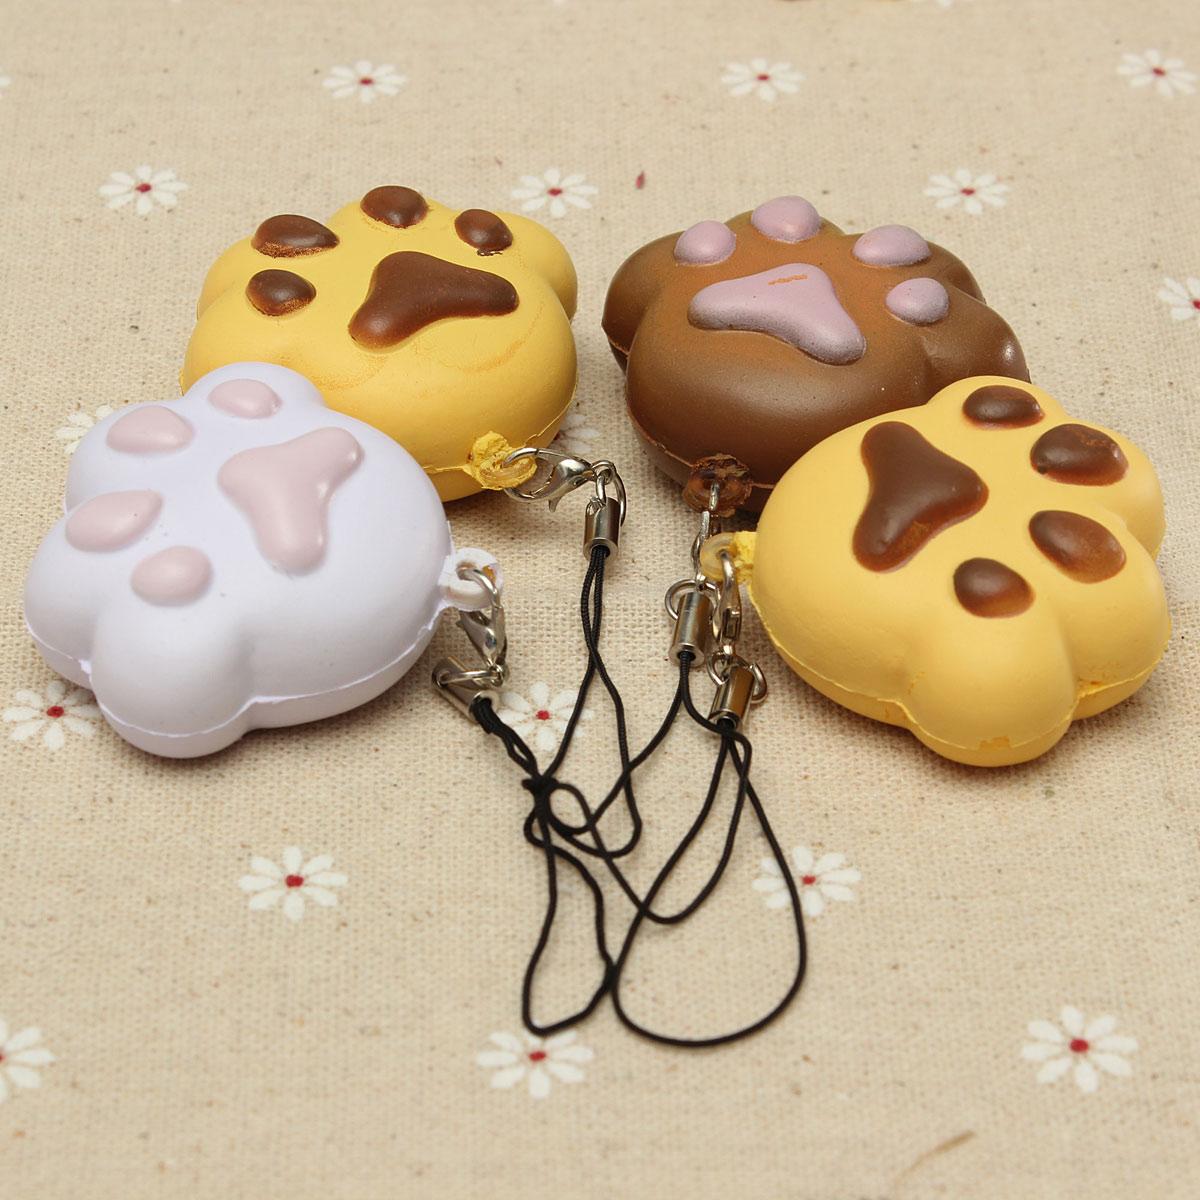 Squishy Cat Stick On Phone : Kawaii Claw Puppy Dog Cat Footprint Squishy Bread Keychain Bag Phone Charm Strap eBay